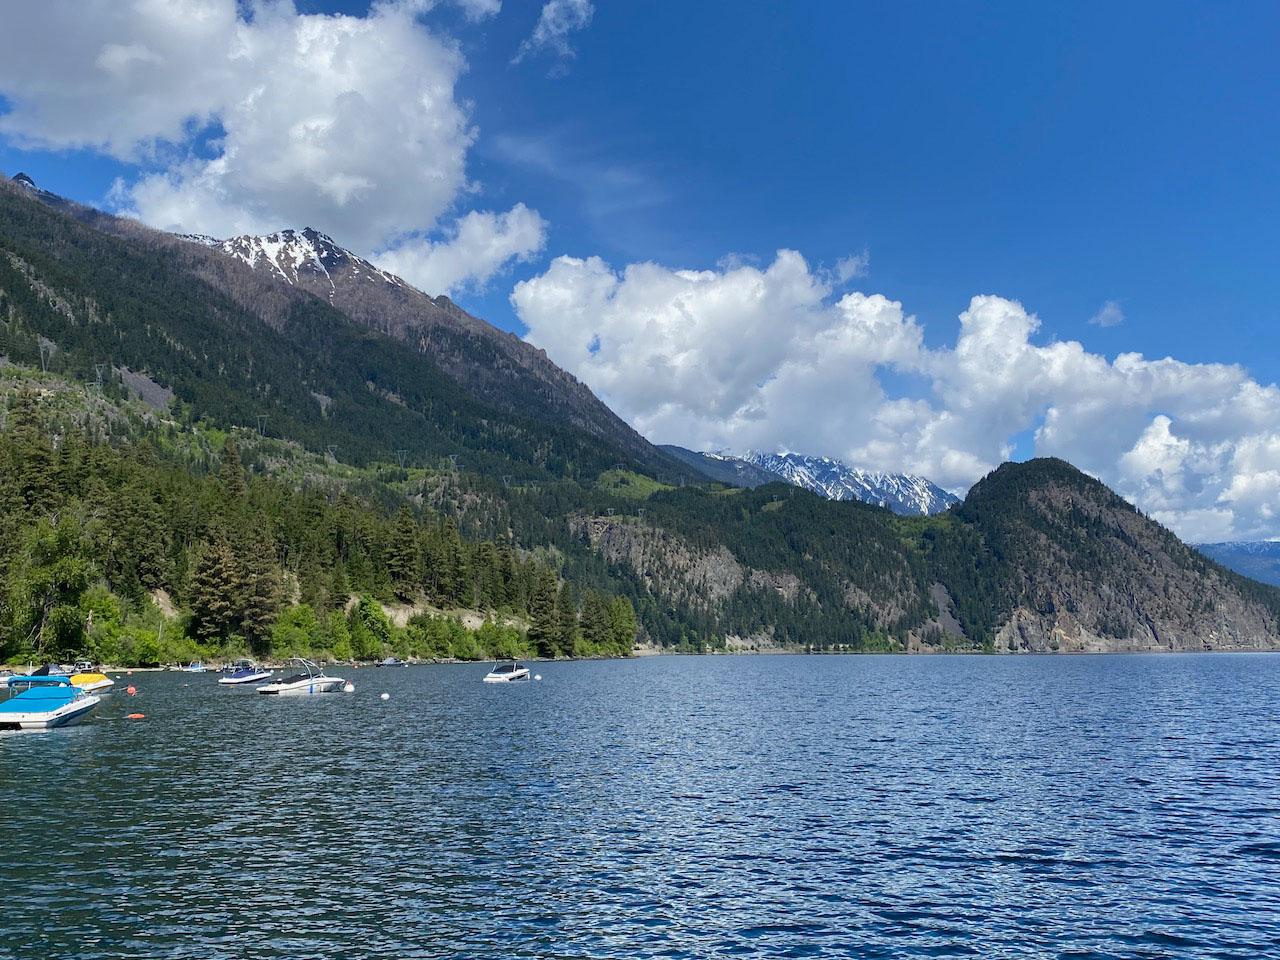 Anderson lake 17